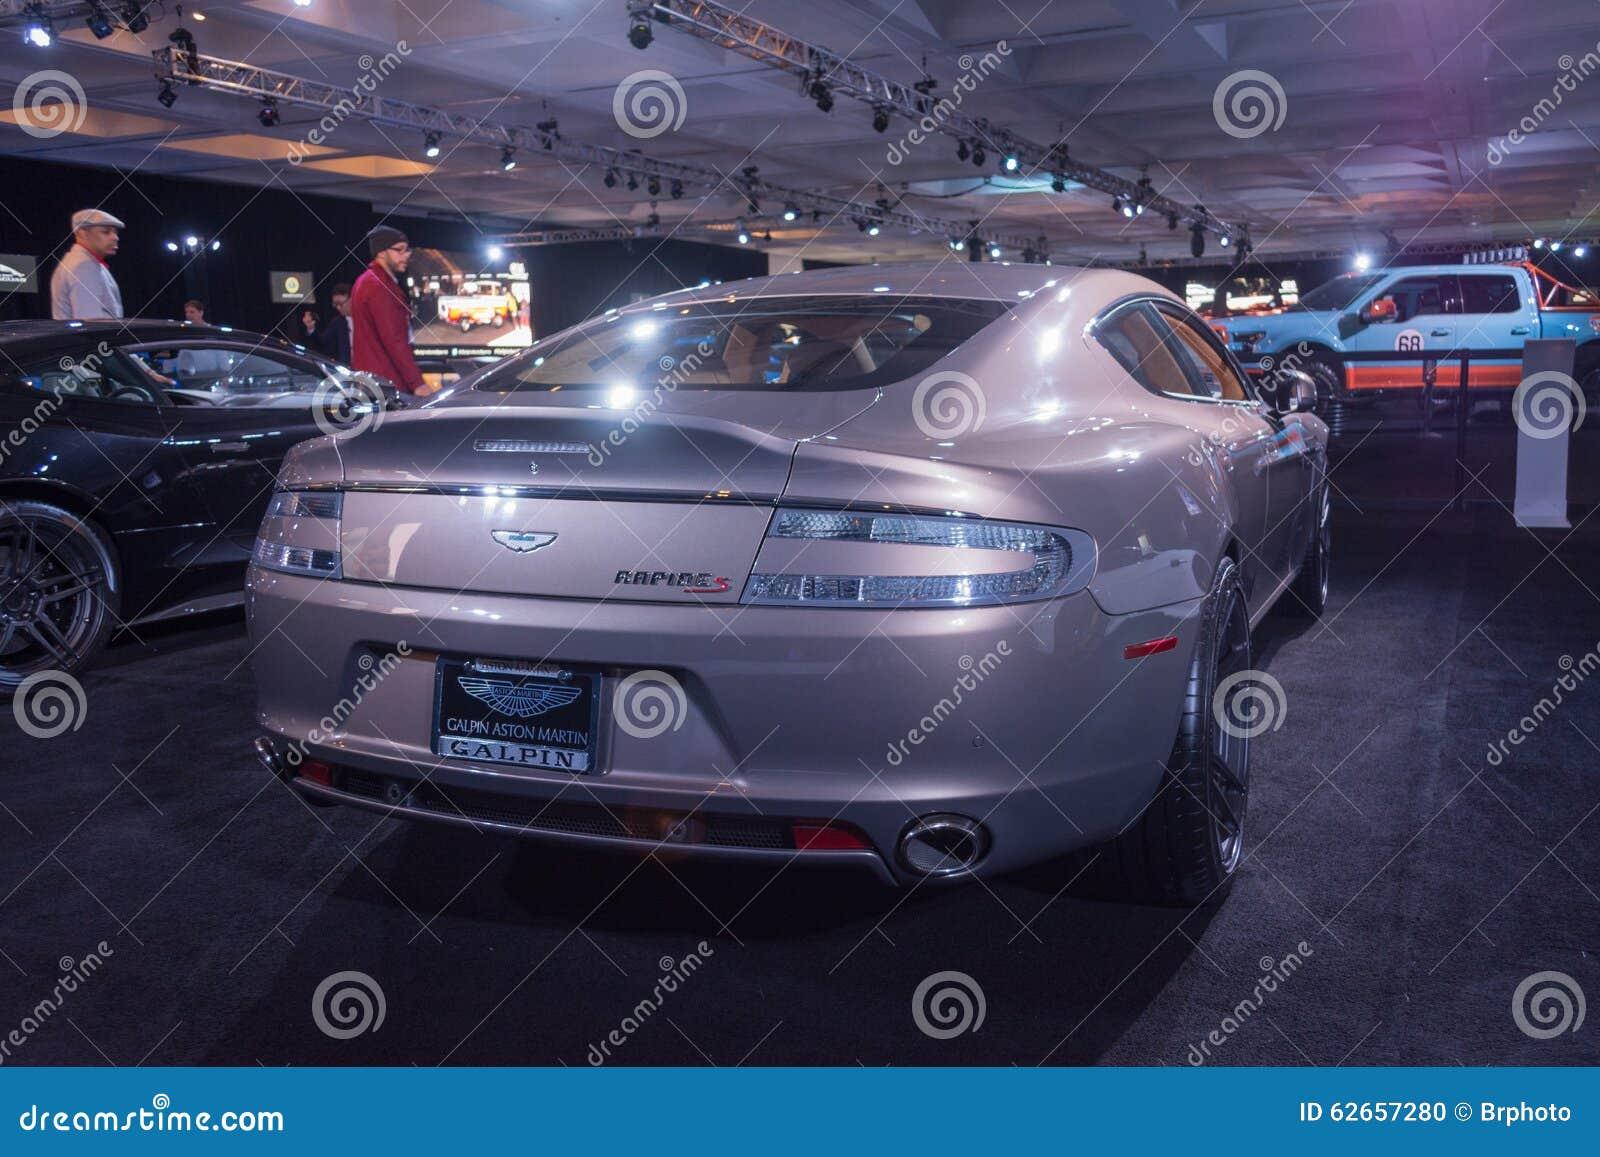 Aston Martin Rapide S Editorial Image Image Of Innovation 62657280